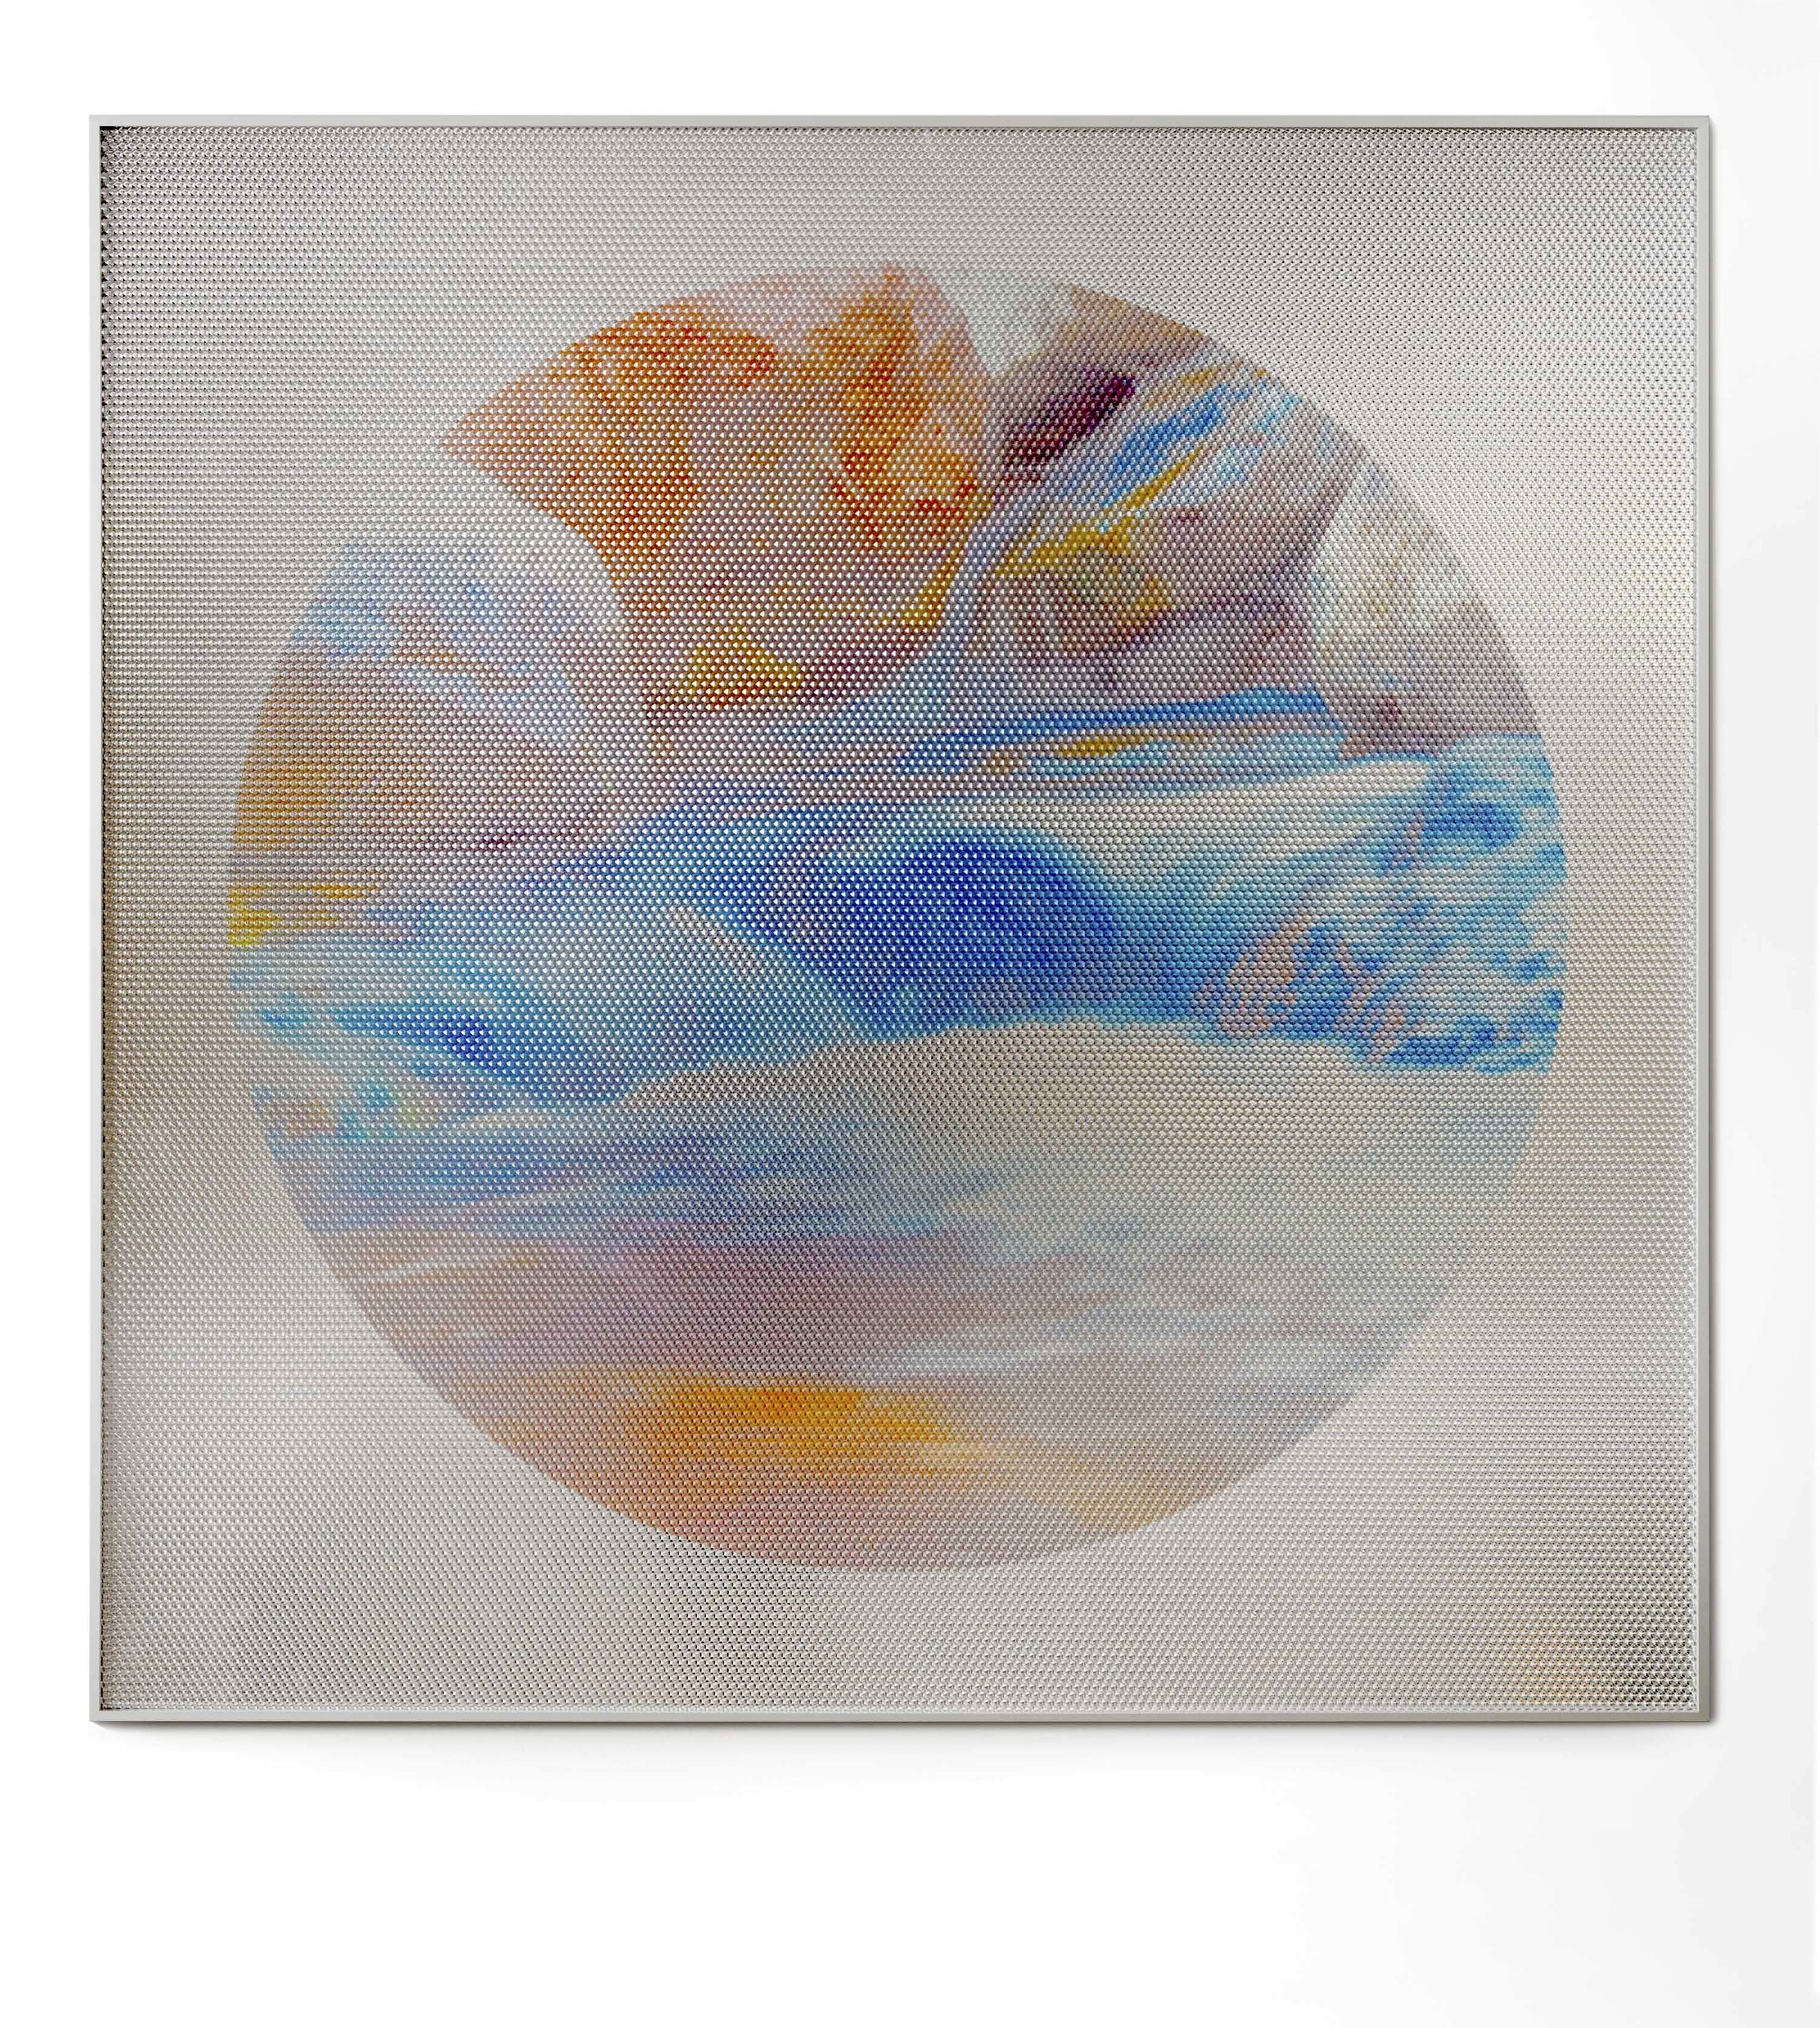 Beyond the Oecumene / Part XXVII,  2019 Aquarelle, wax pastels, UV-print on mirror beneath structured Plexiglas 120 x 120 cm (47 x 47 in)